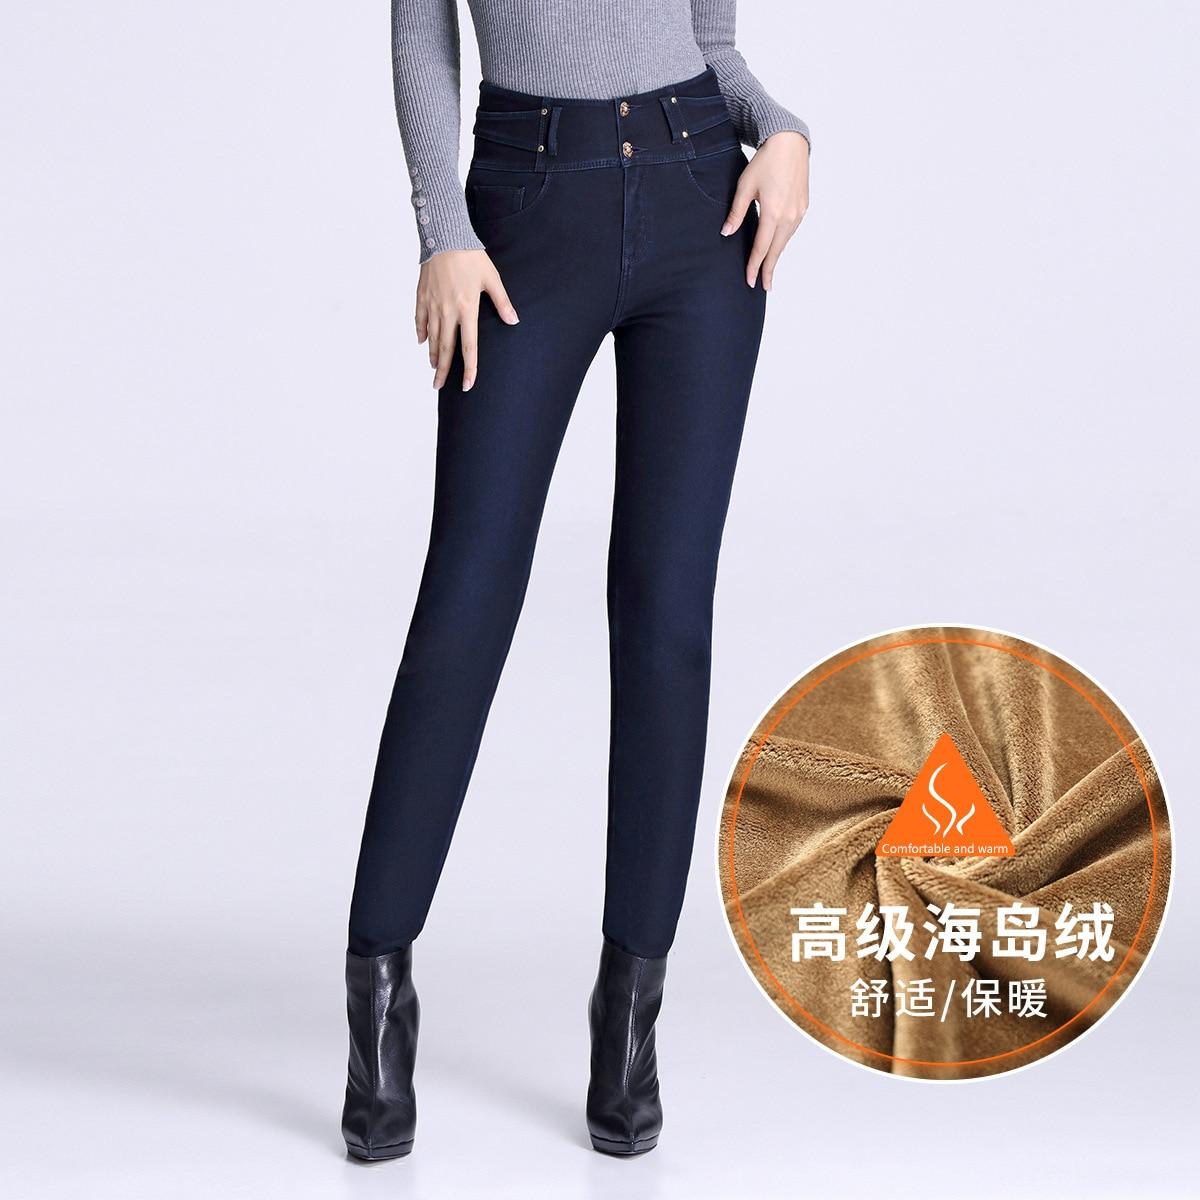 Pantalones Vaqueros Mujeres De Talla 30 31 32 Warm Winter Lady Jeans Pantalones Delgados Jeans Woman Ladies Jeansjeans Slim Aliexpress